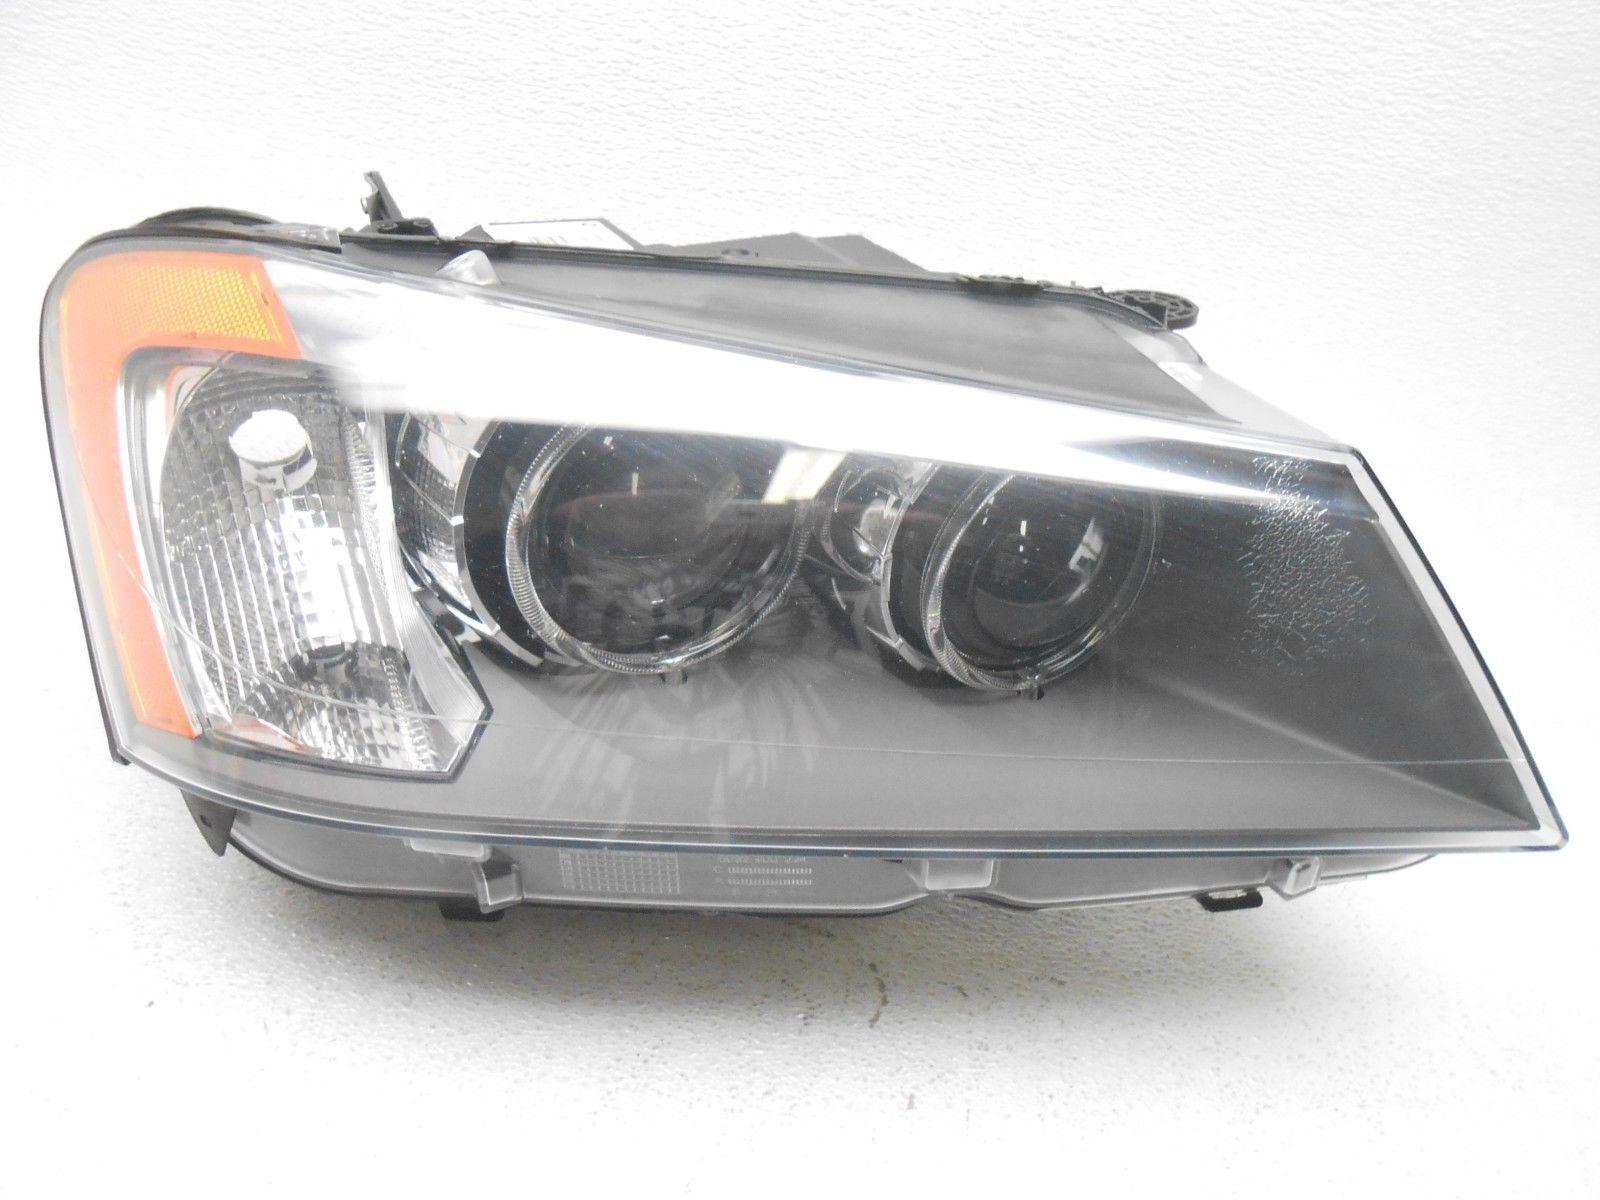 OEM BMW X3 Right Xenon HID Headlamp Headlight With ADF 2011-2014   eBay